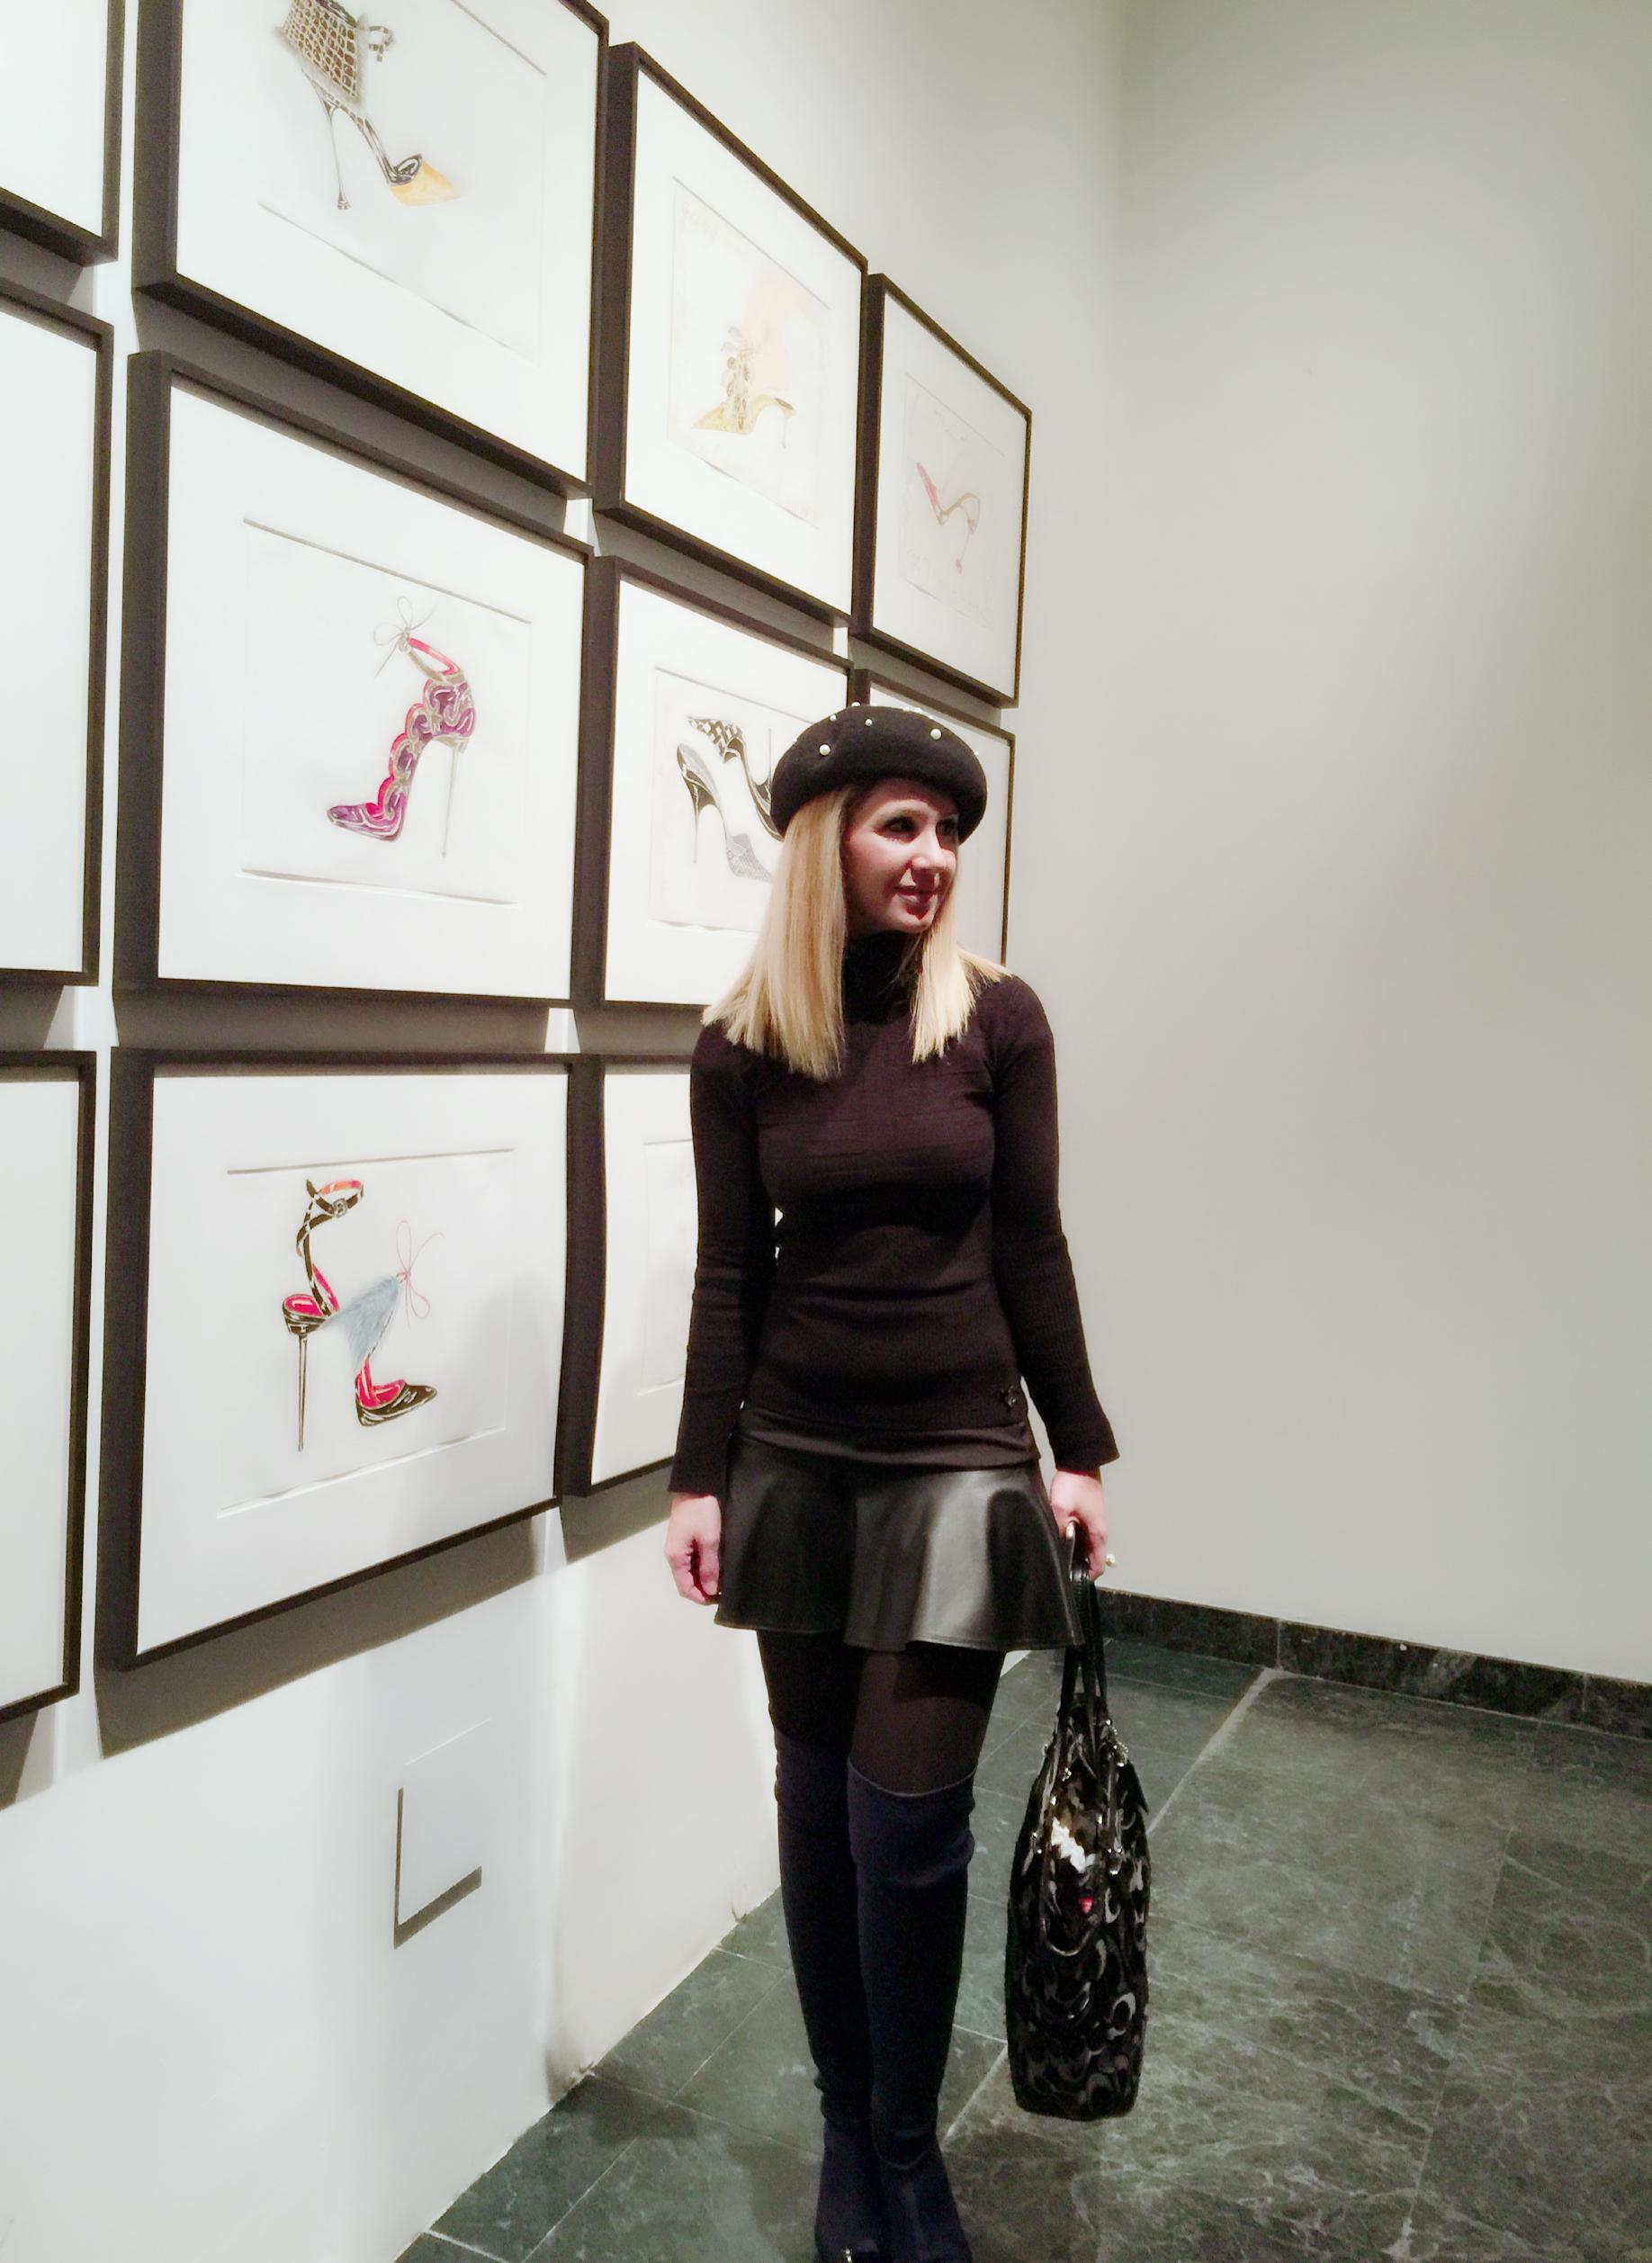 Manolo Blahnik exhibition